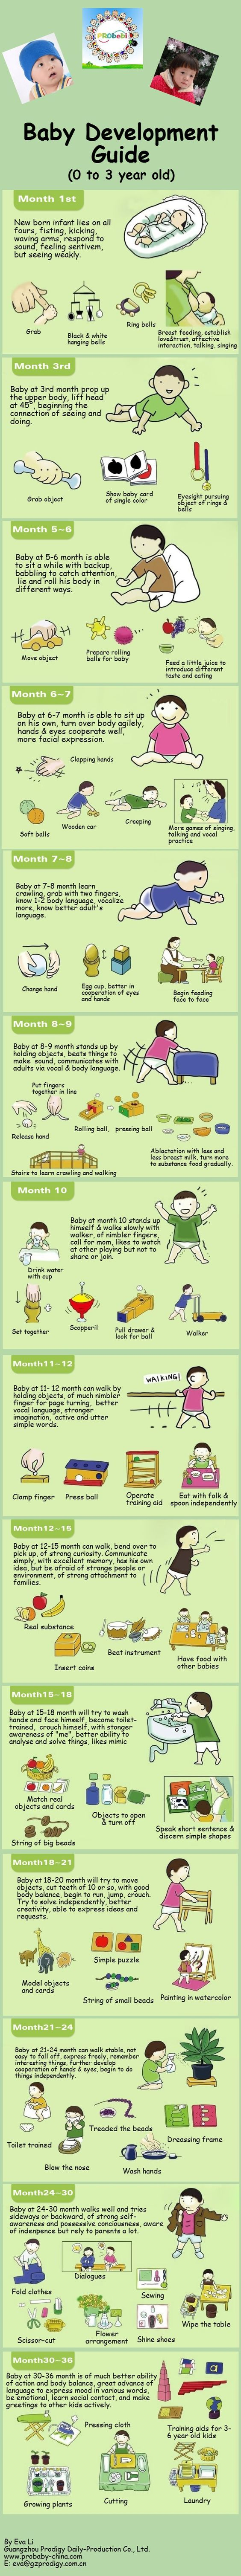 Baby Development Guide | @Piktochart #Infographic Editor